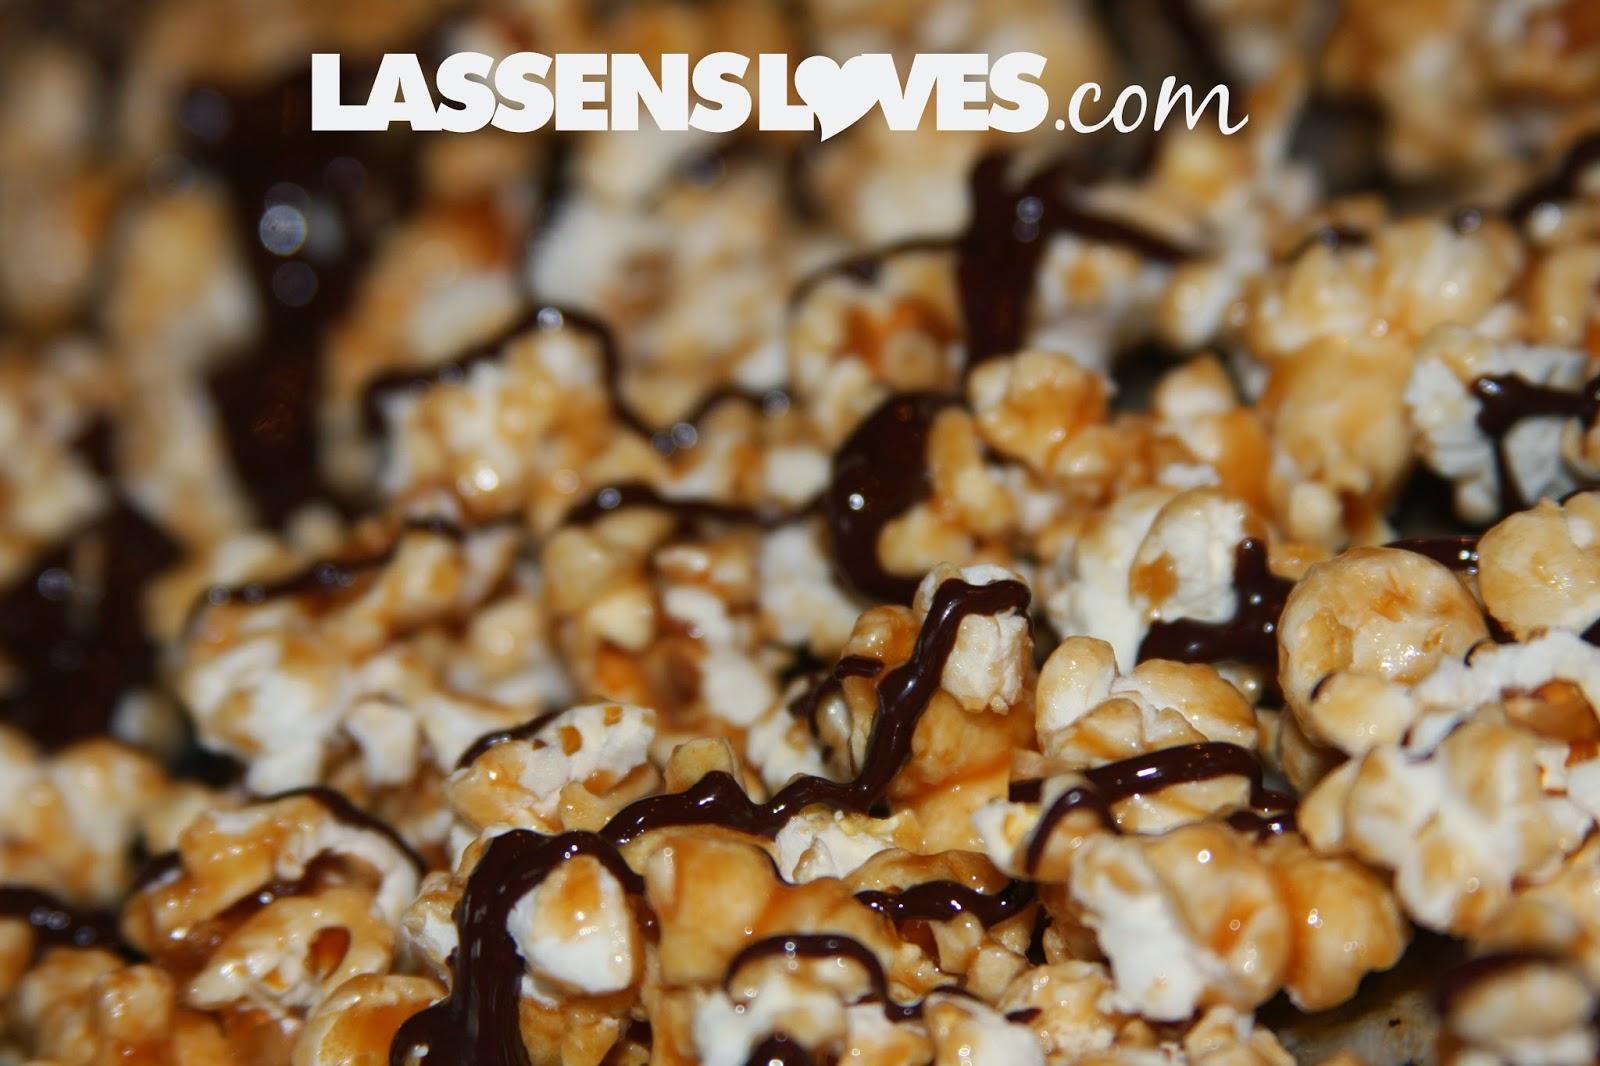 agave+caramel+popcorn, agave+caramel